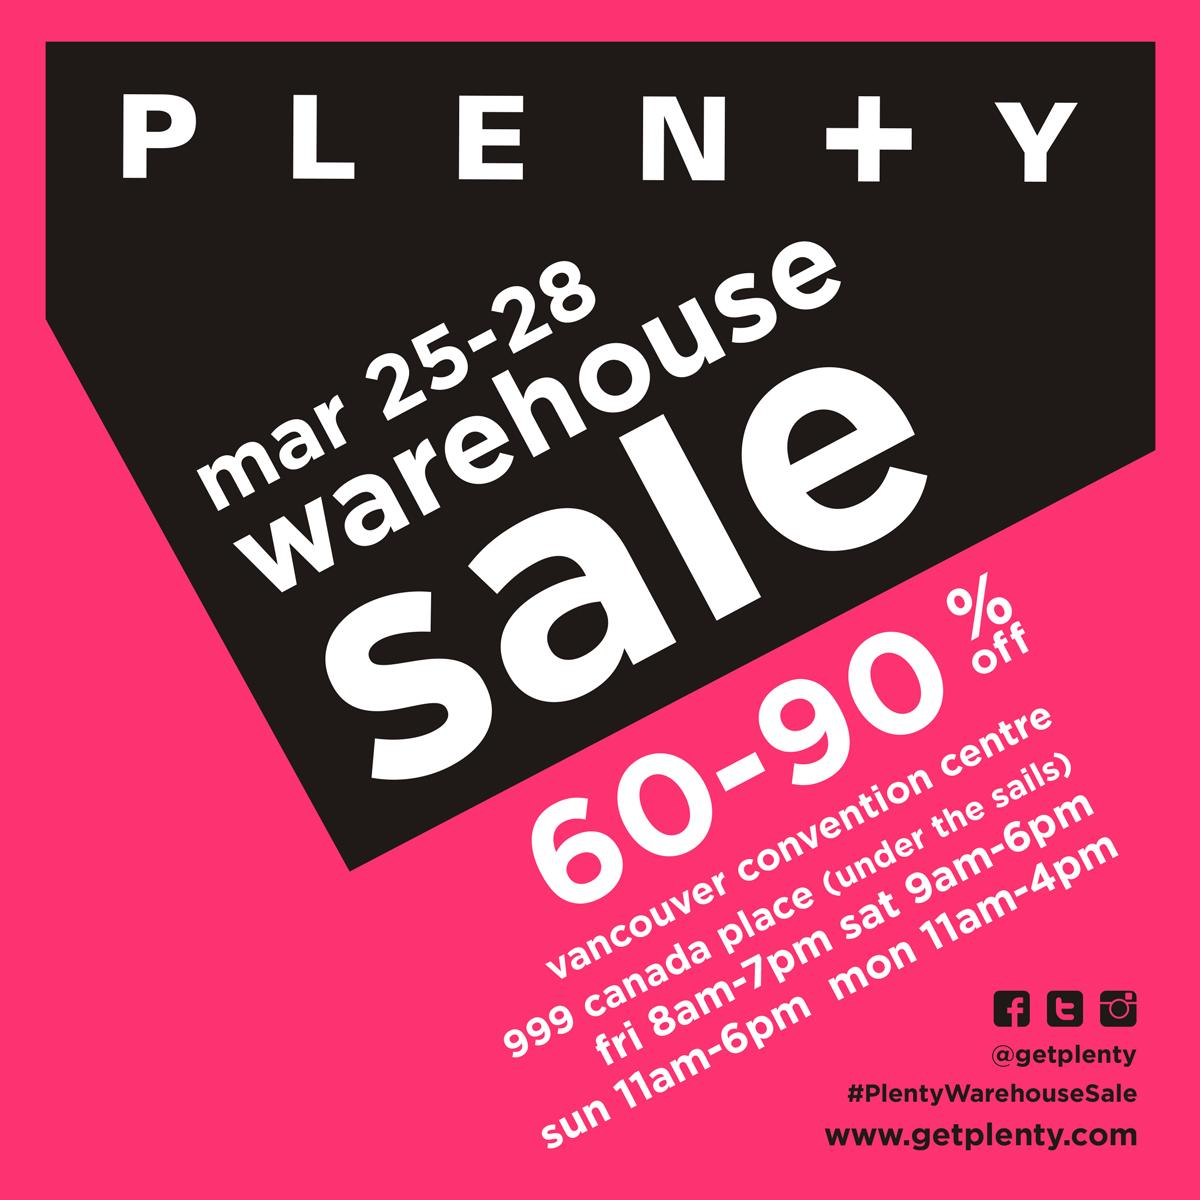 Image: Plenty Warehouse Sale